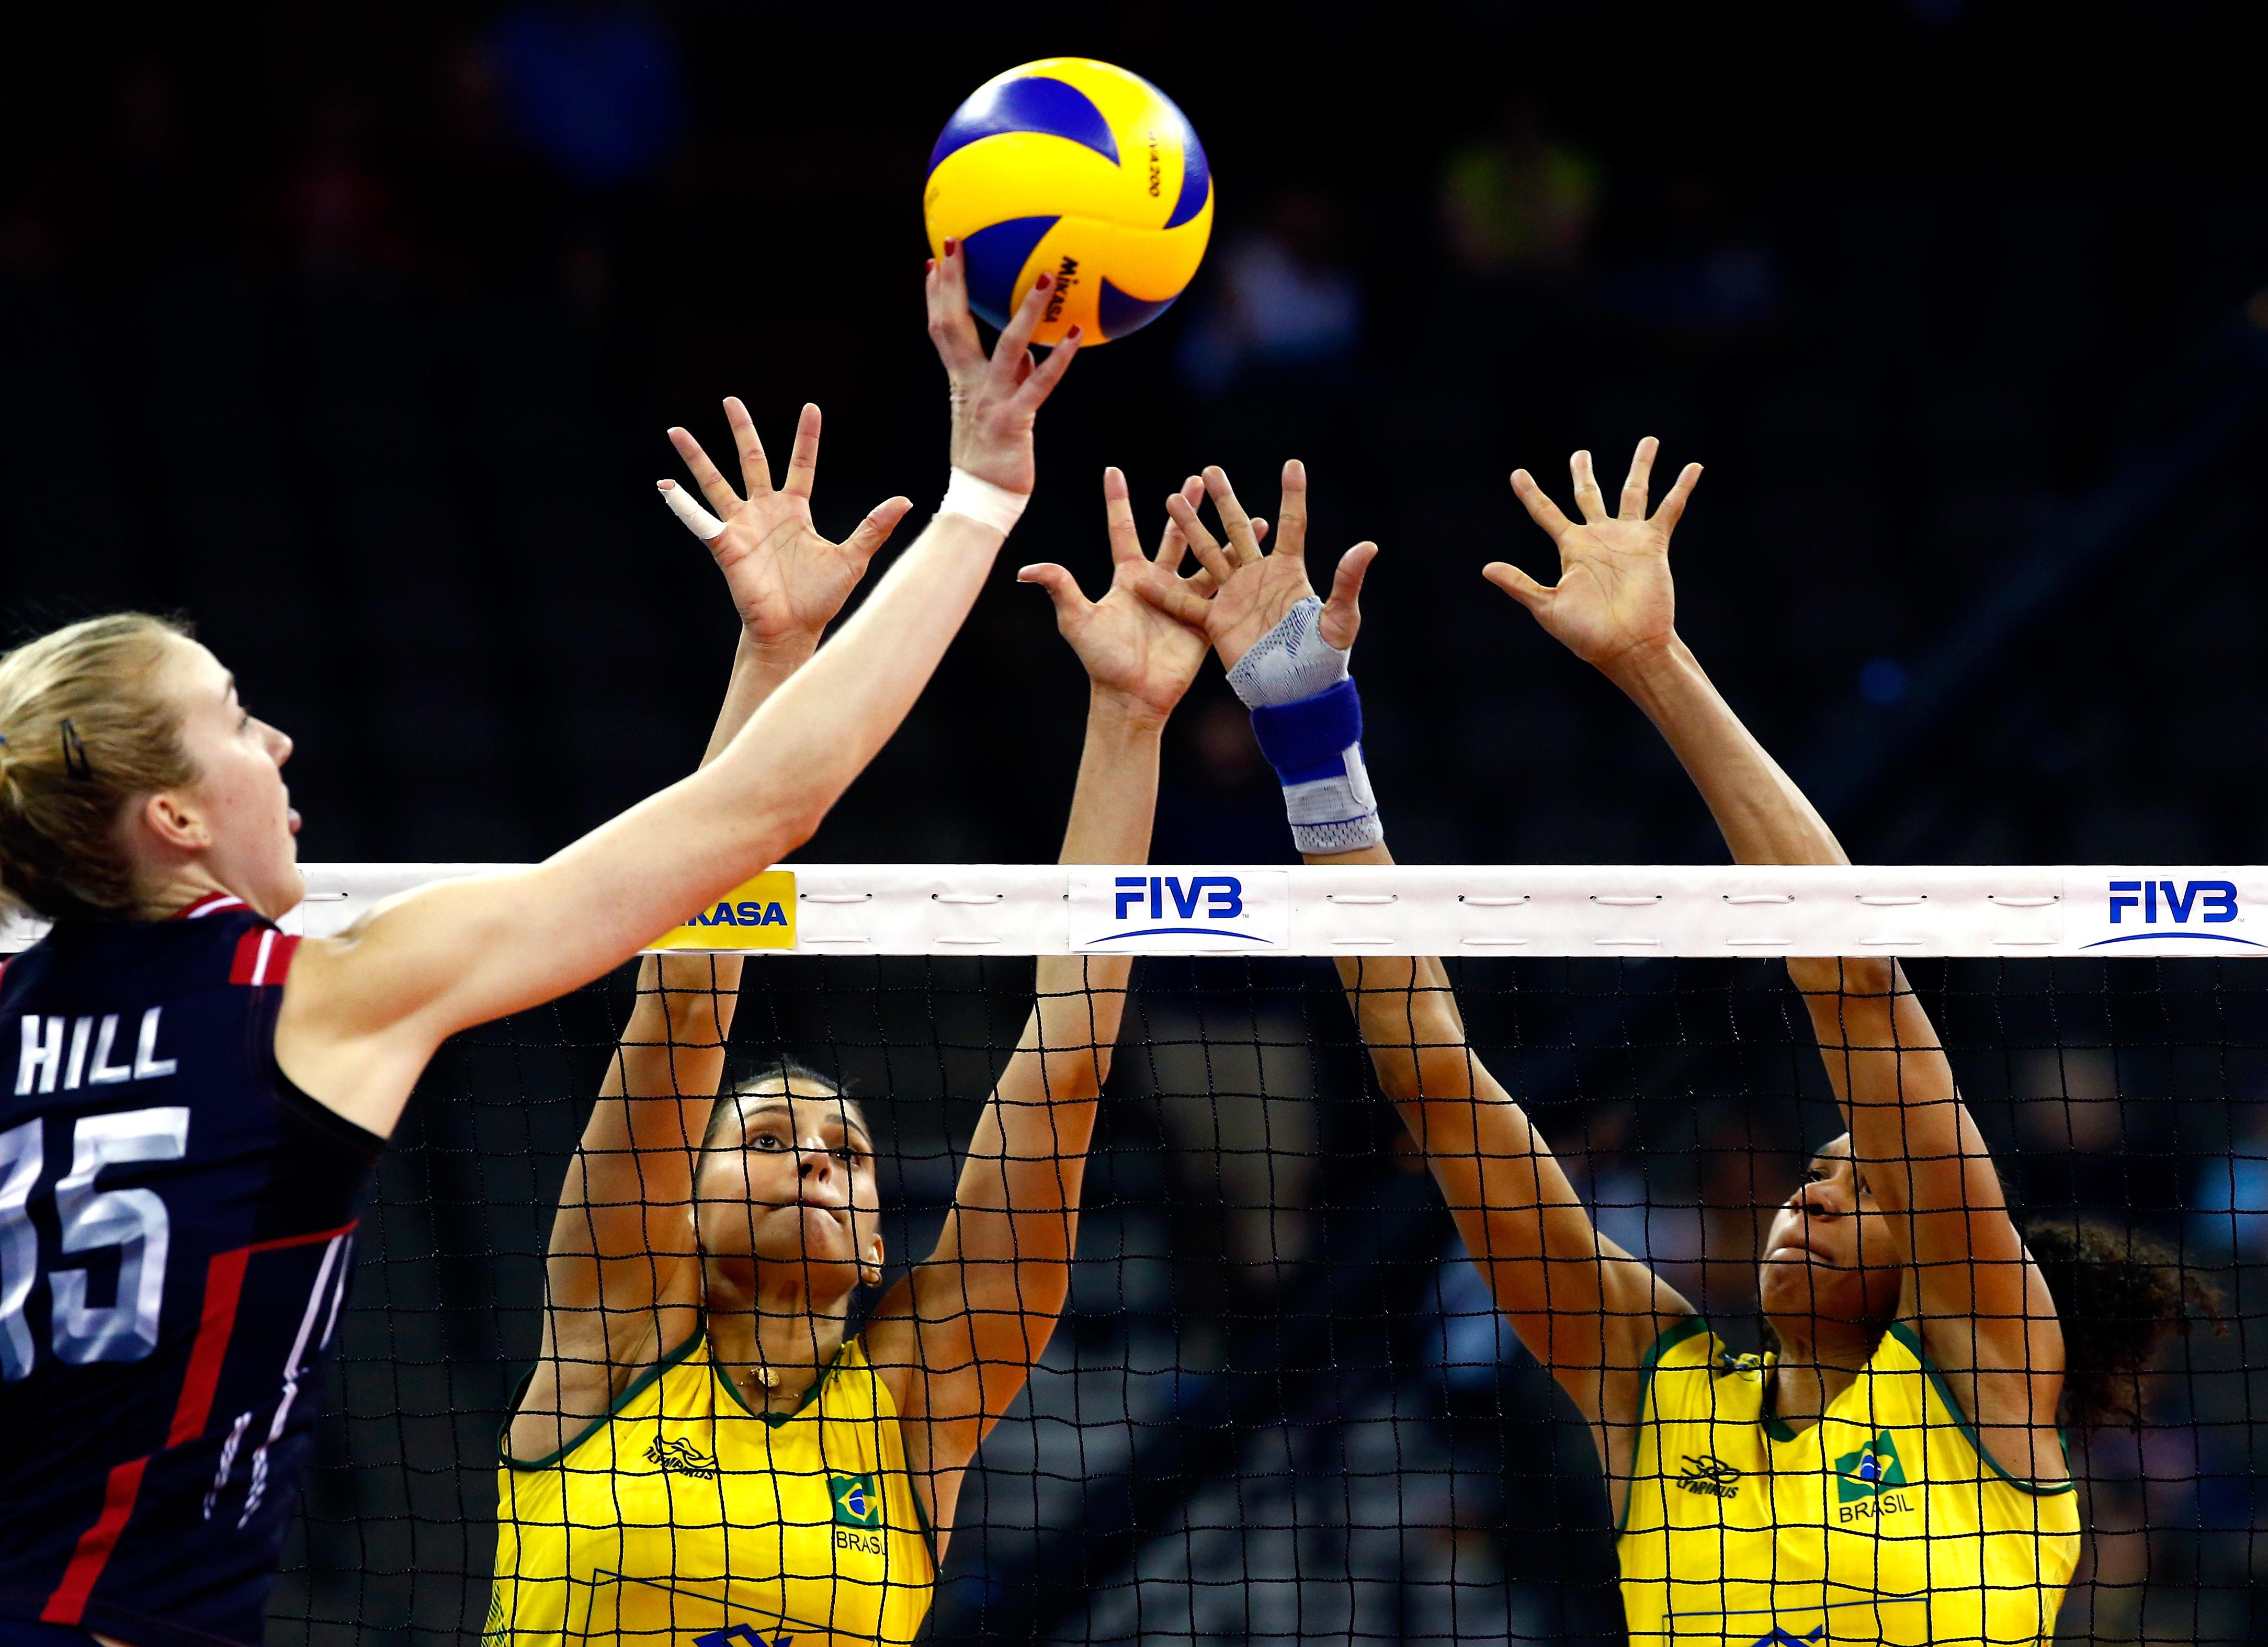 FIVB Volleyball World Grand Prix - Day 4